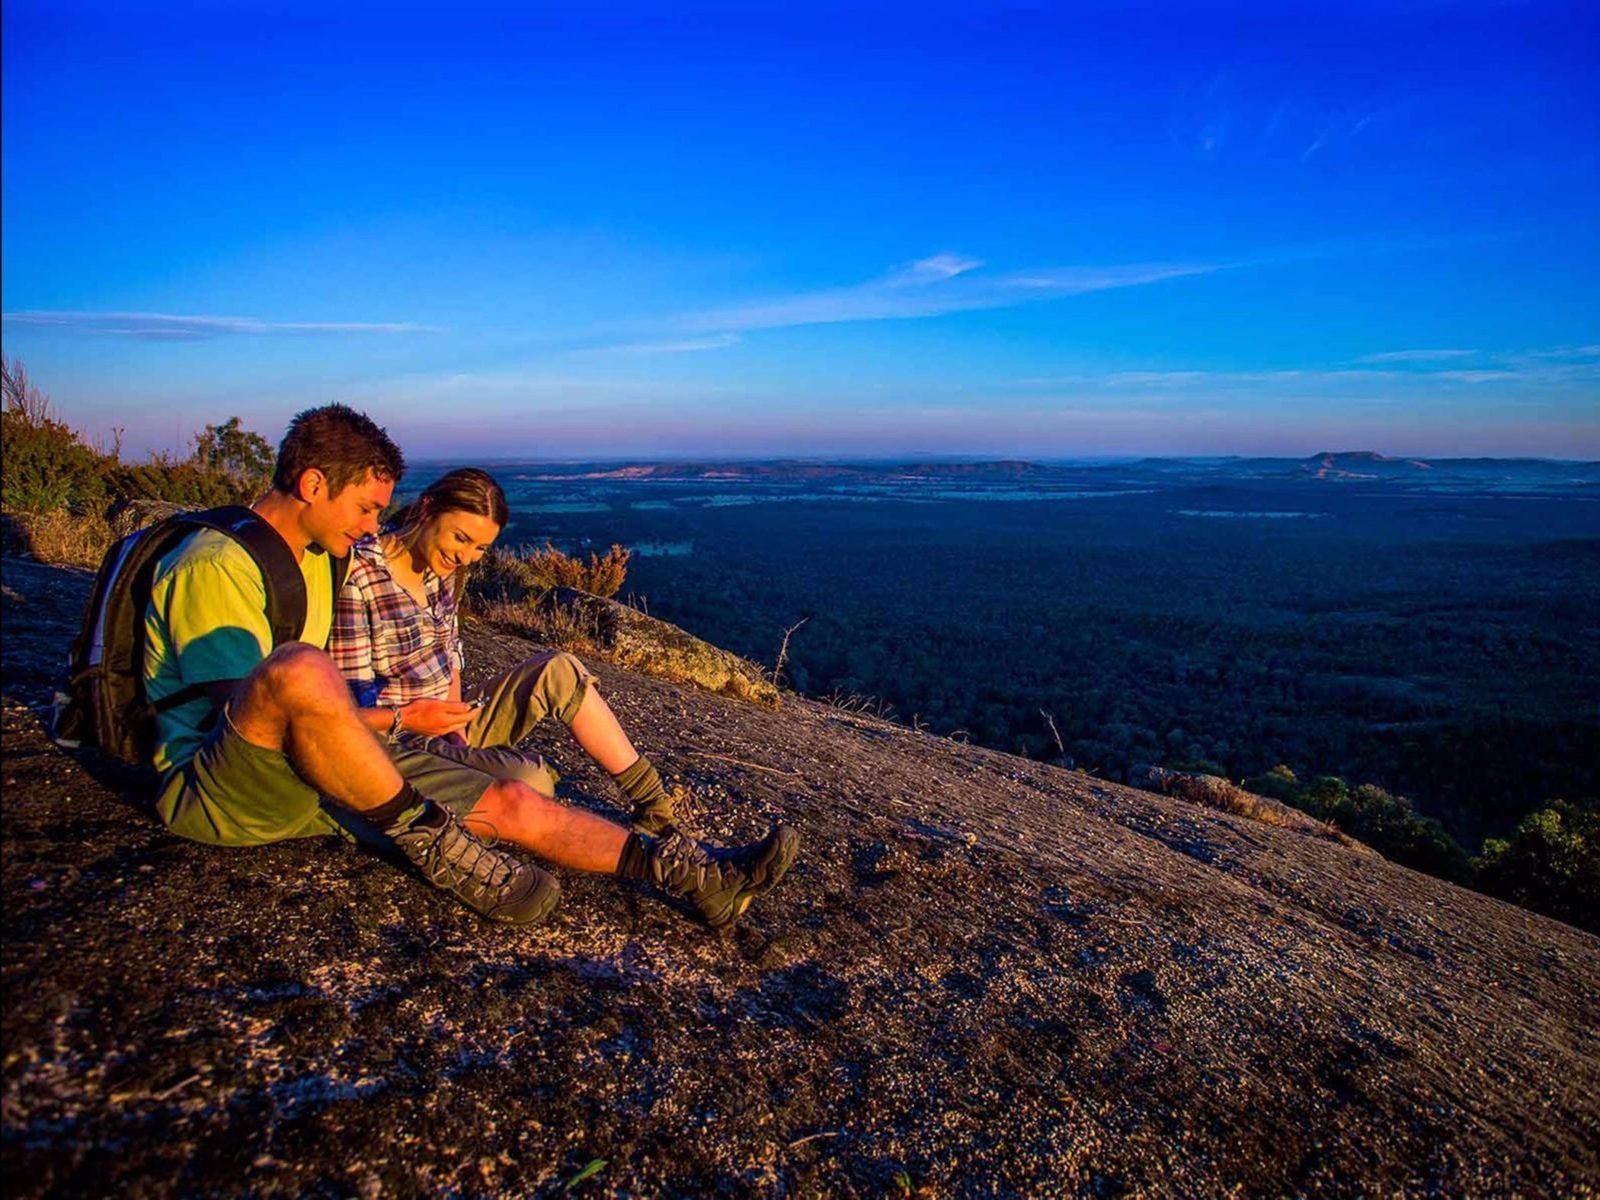 Chiltern-Mt Pilot National Park